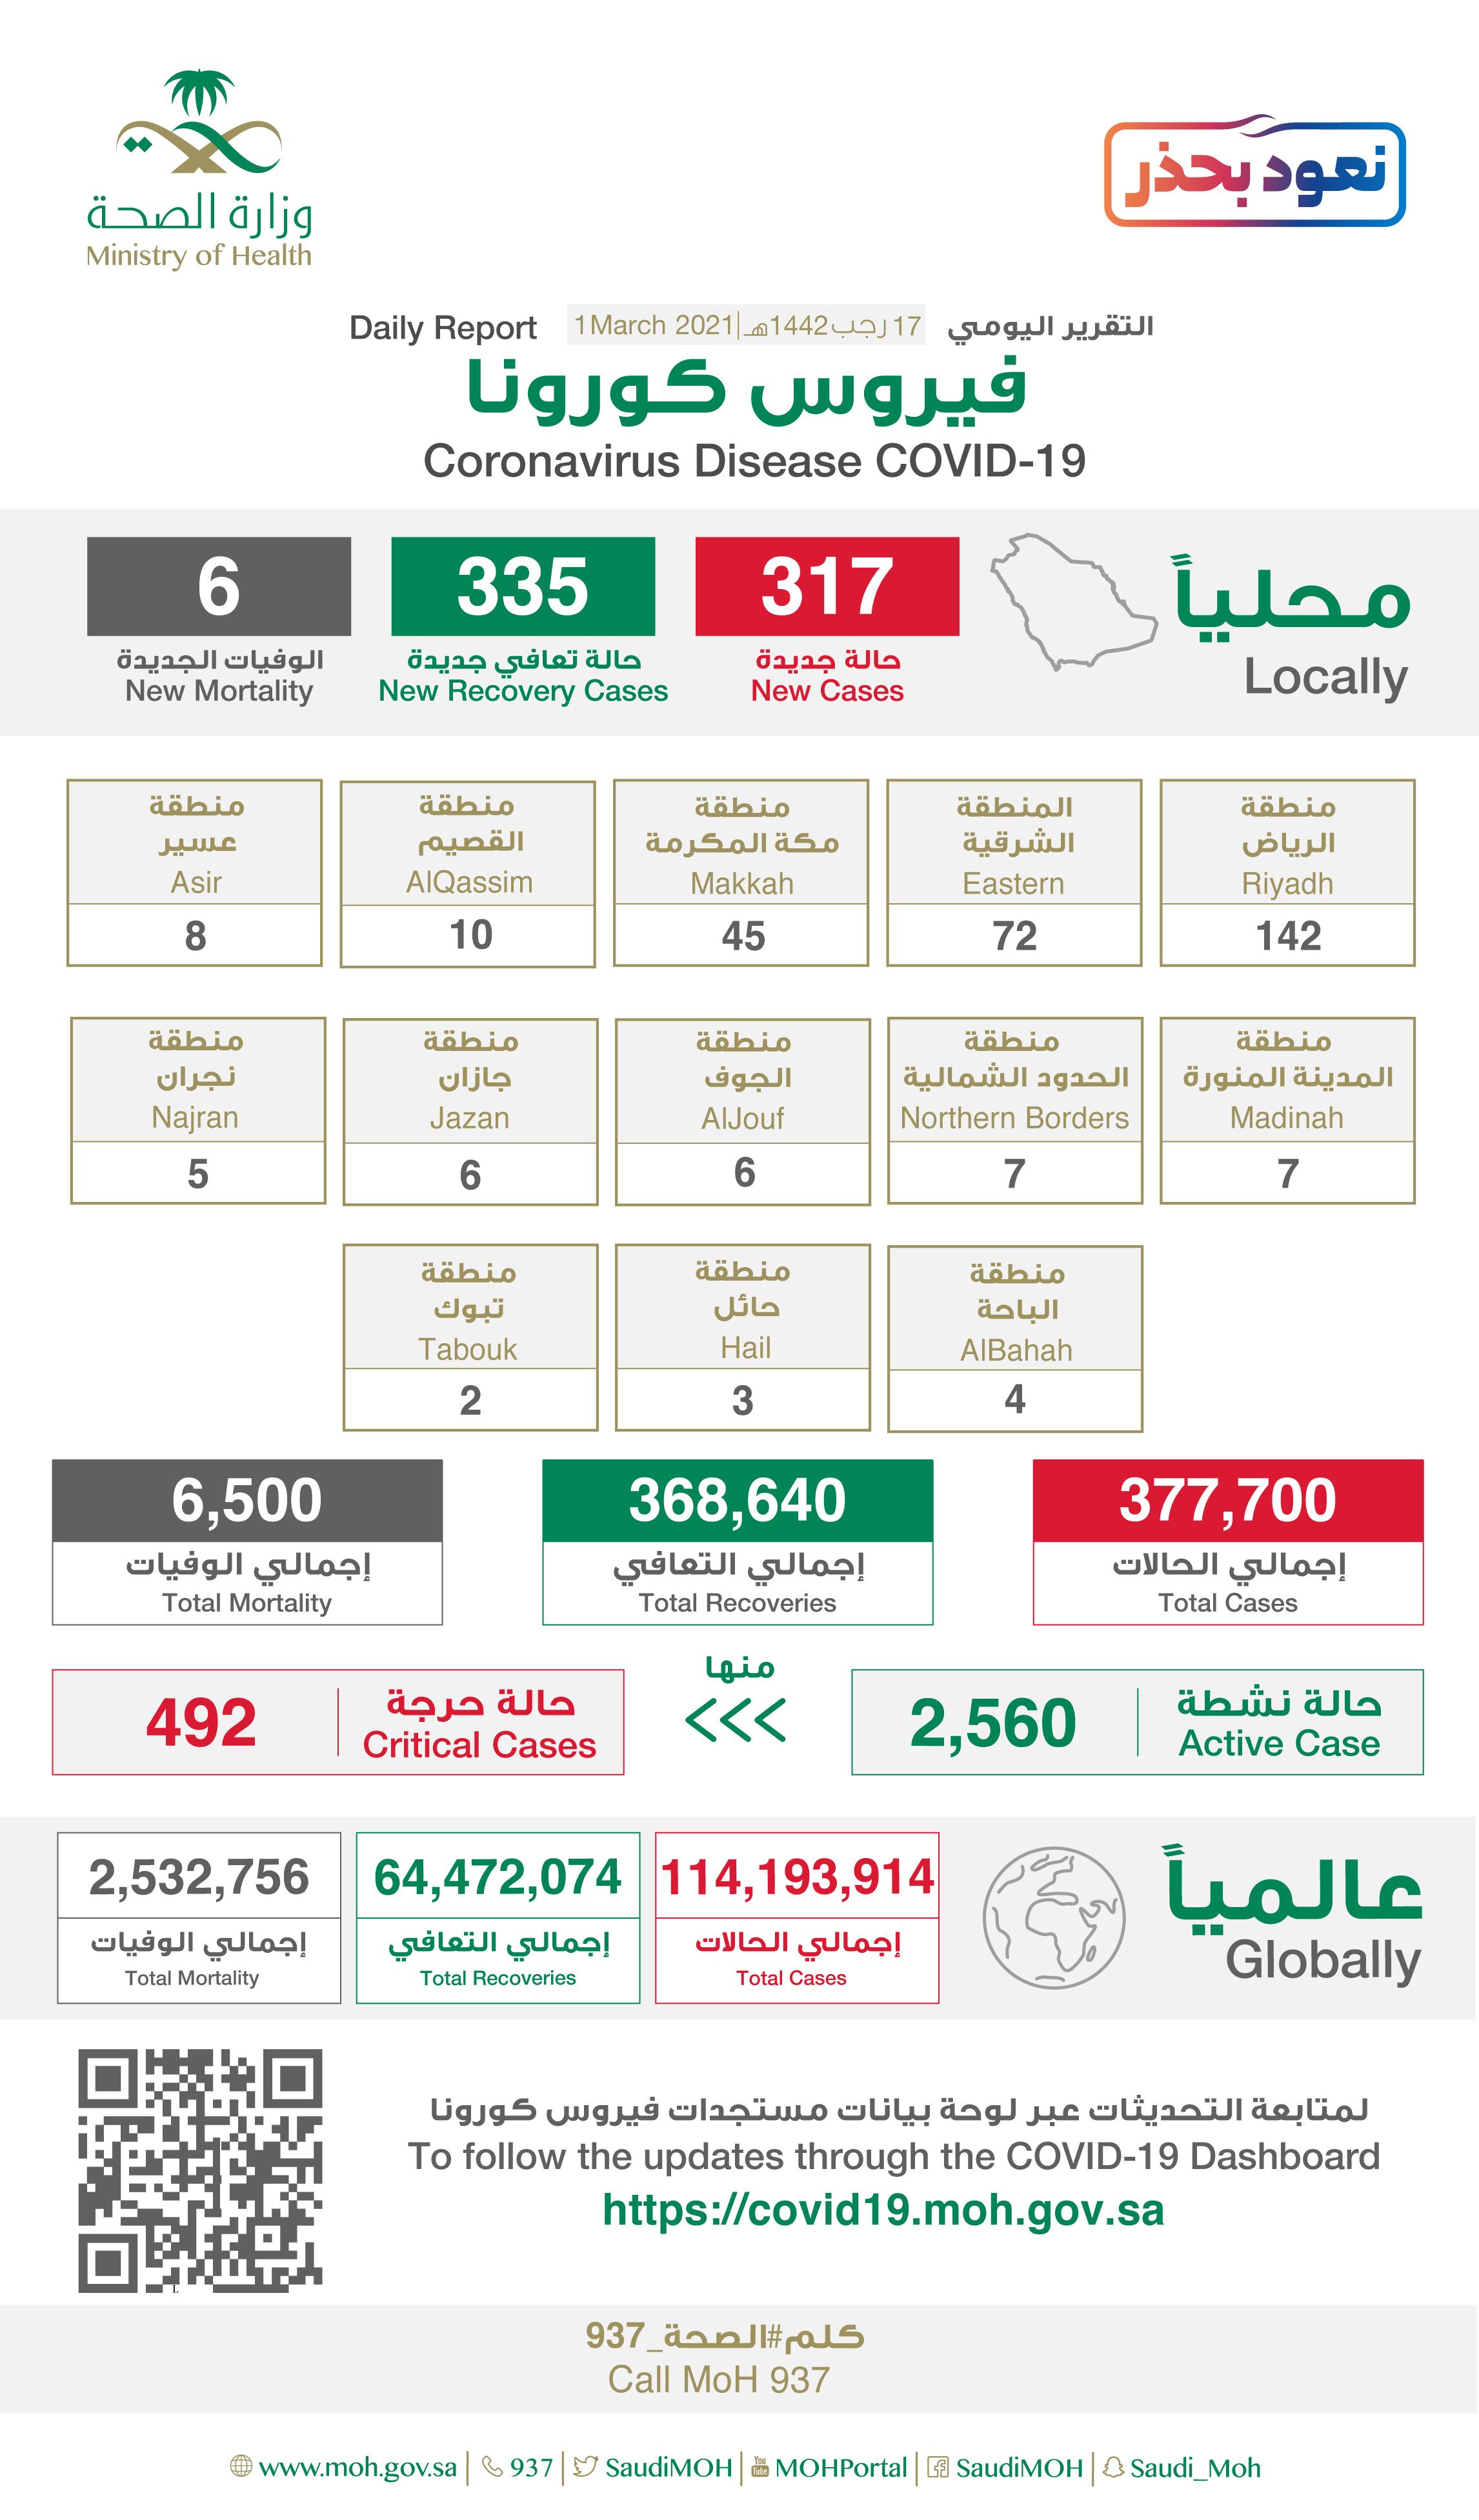 Saudi Arabia Coronavirus : Total Cases :377,700 , New Cases : 317, Cured : 368,640 , Deaths: 6,500, Active Cases : 2,560